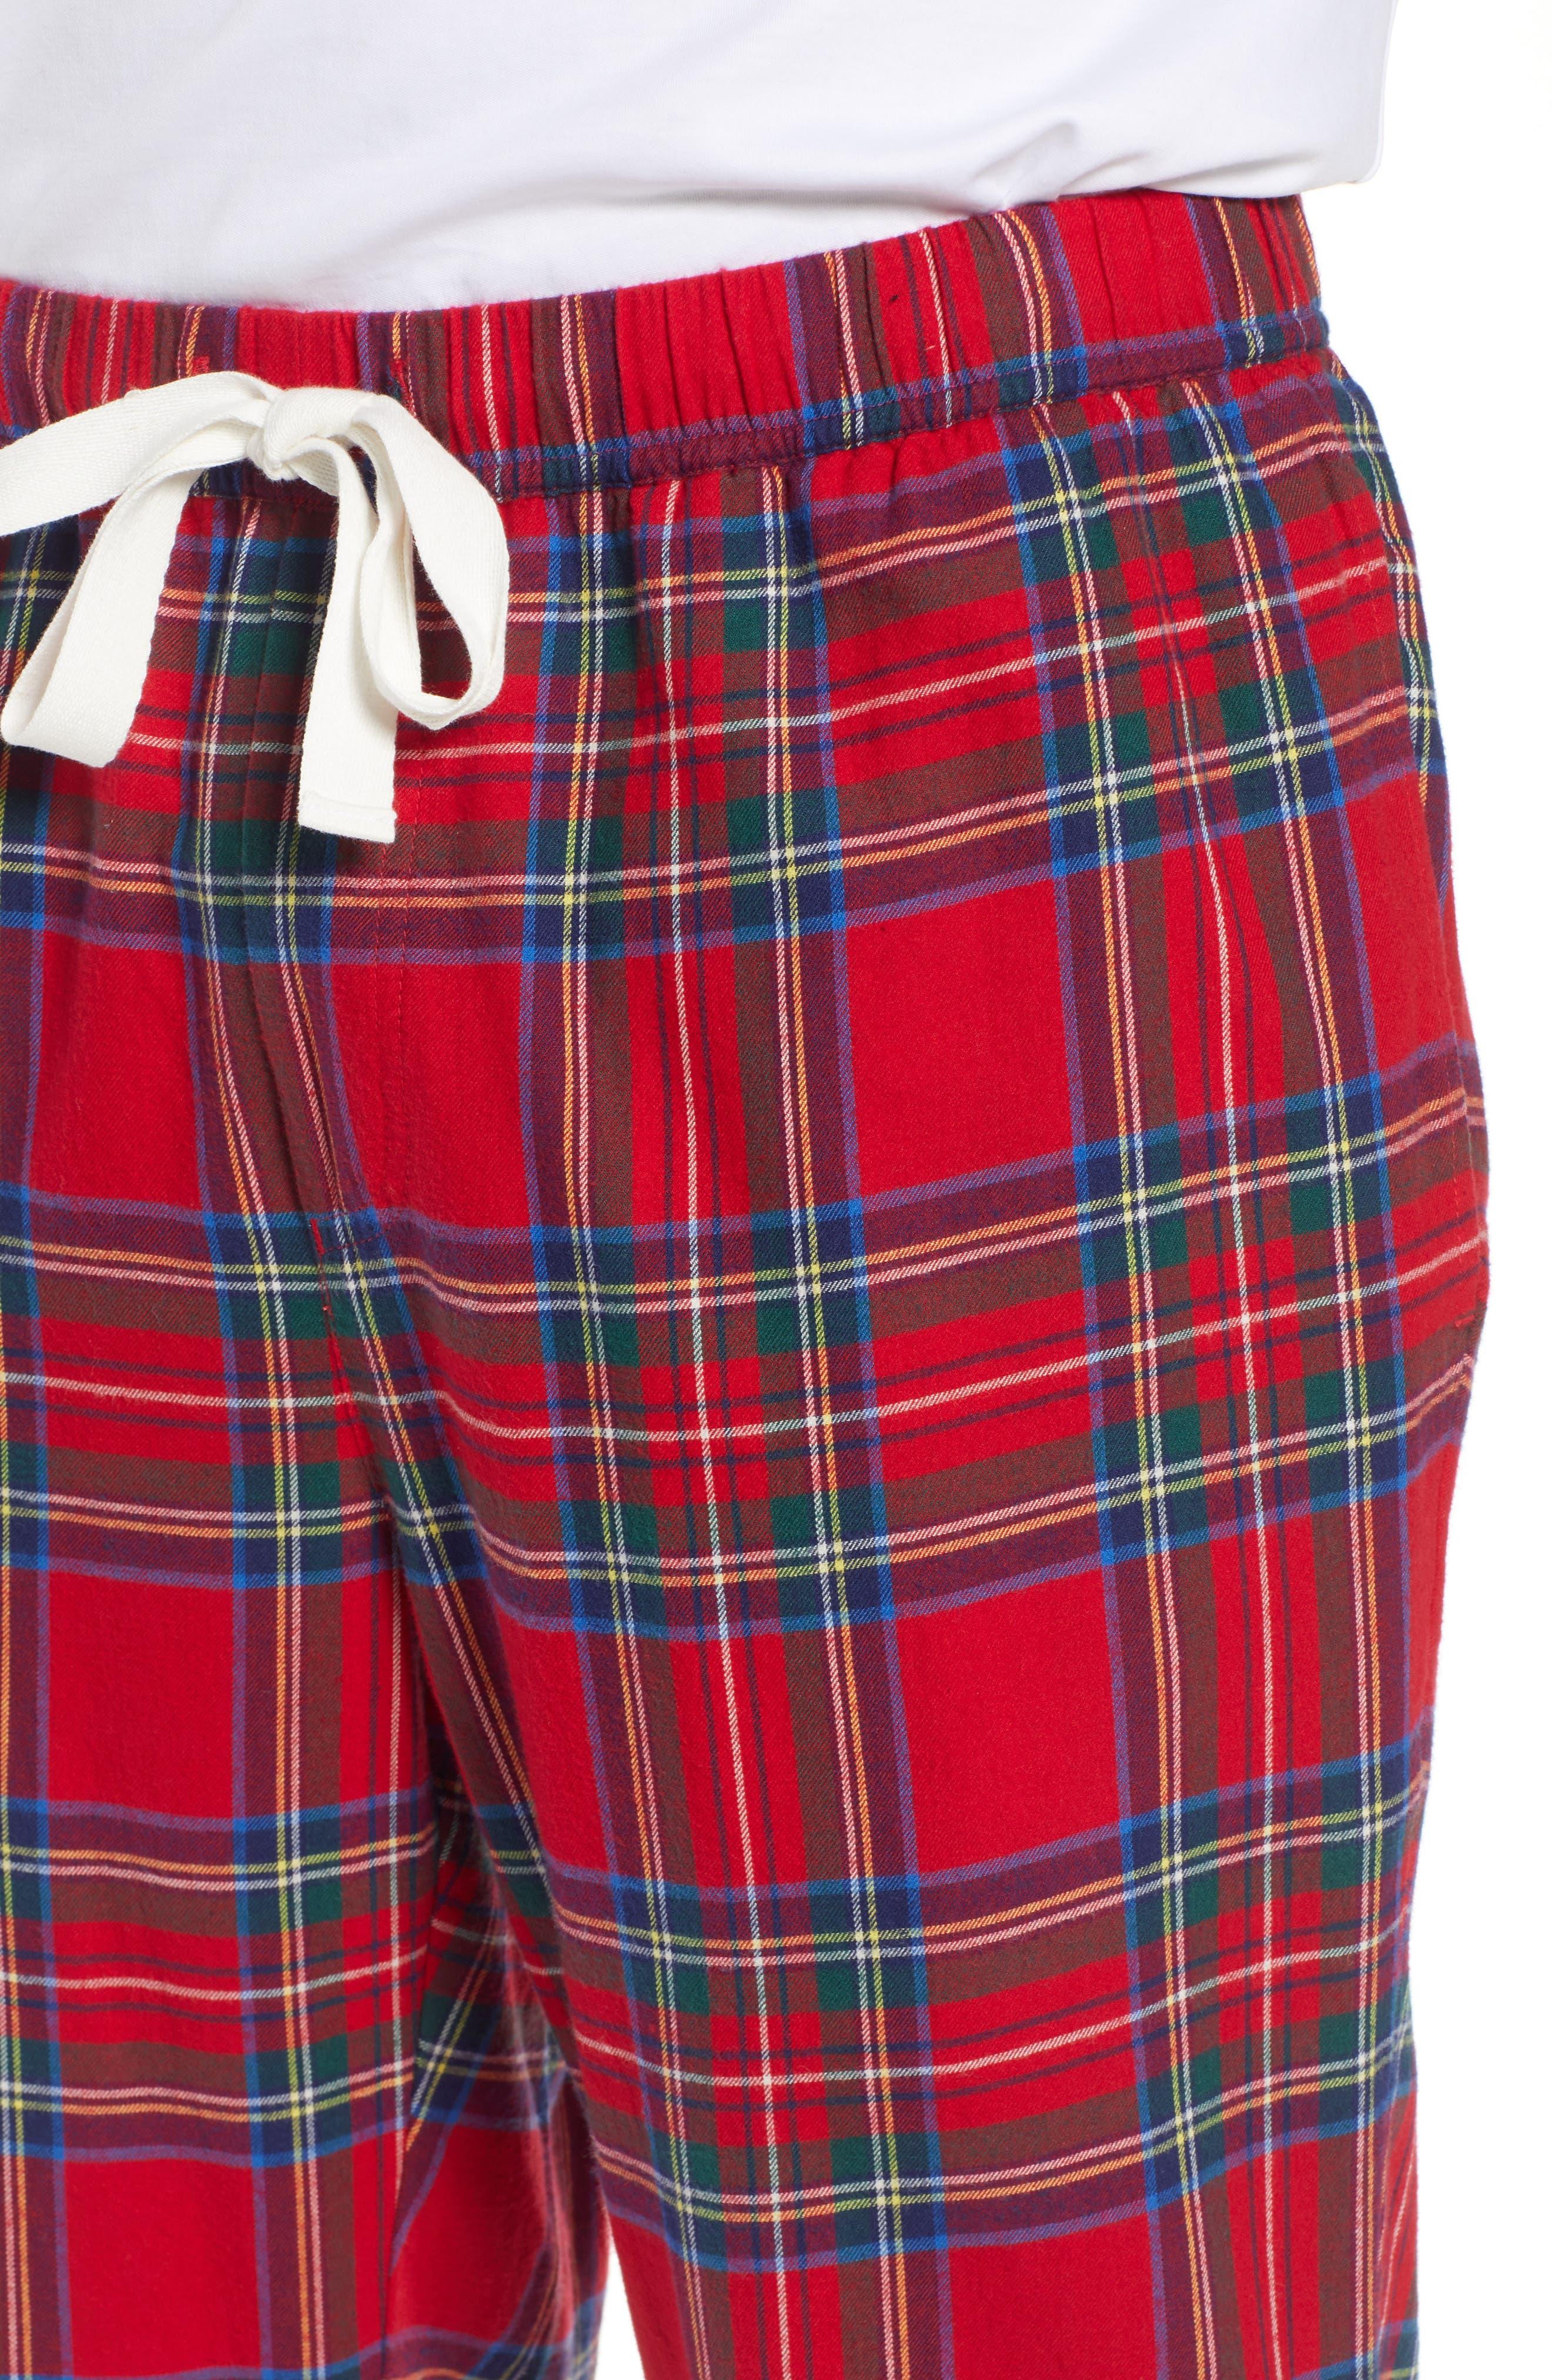 Jolly Plaid Cotton Flannel Pajama Pants,                             Alternate thumbnail 4, color,                             786